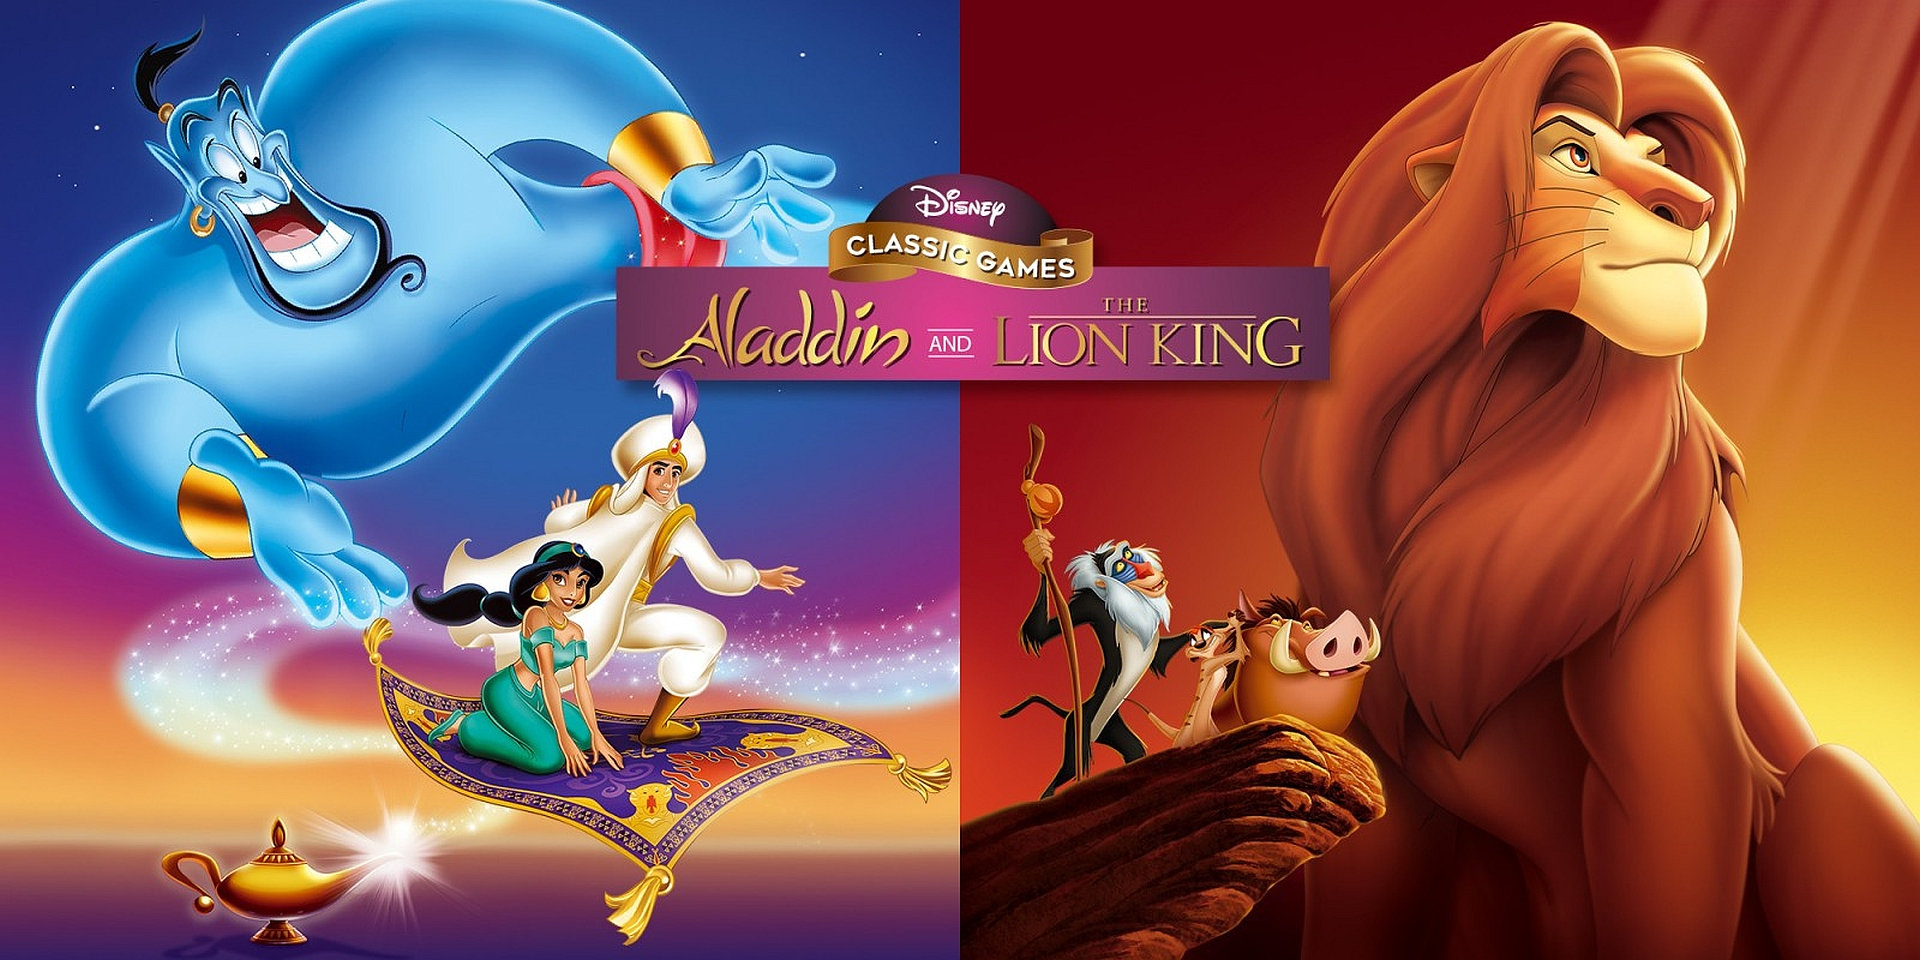 Games Aladin